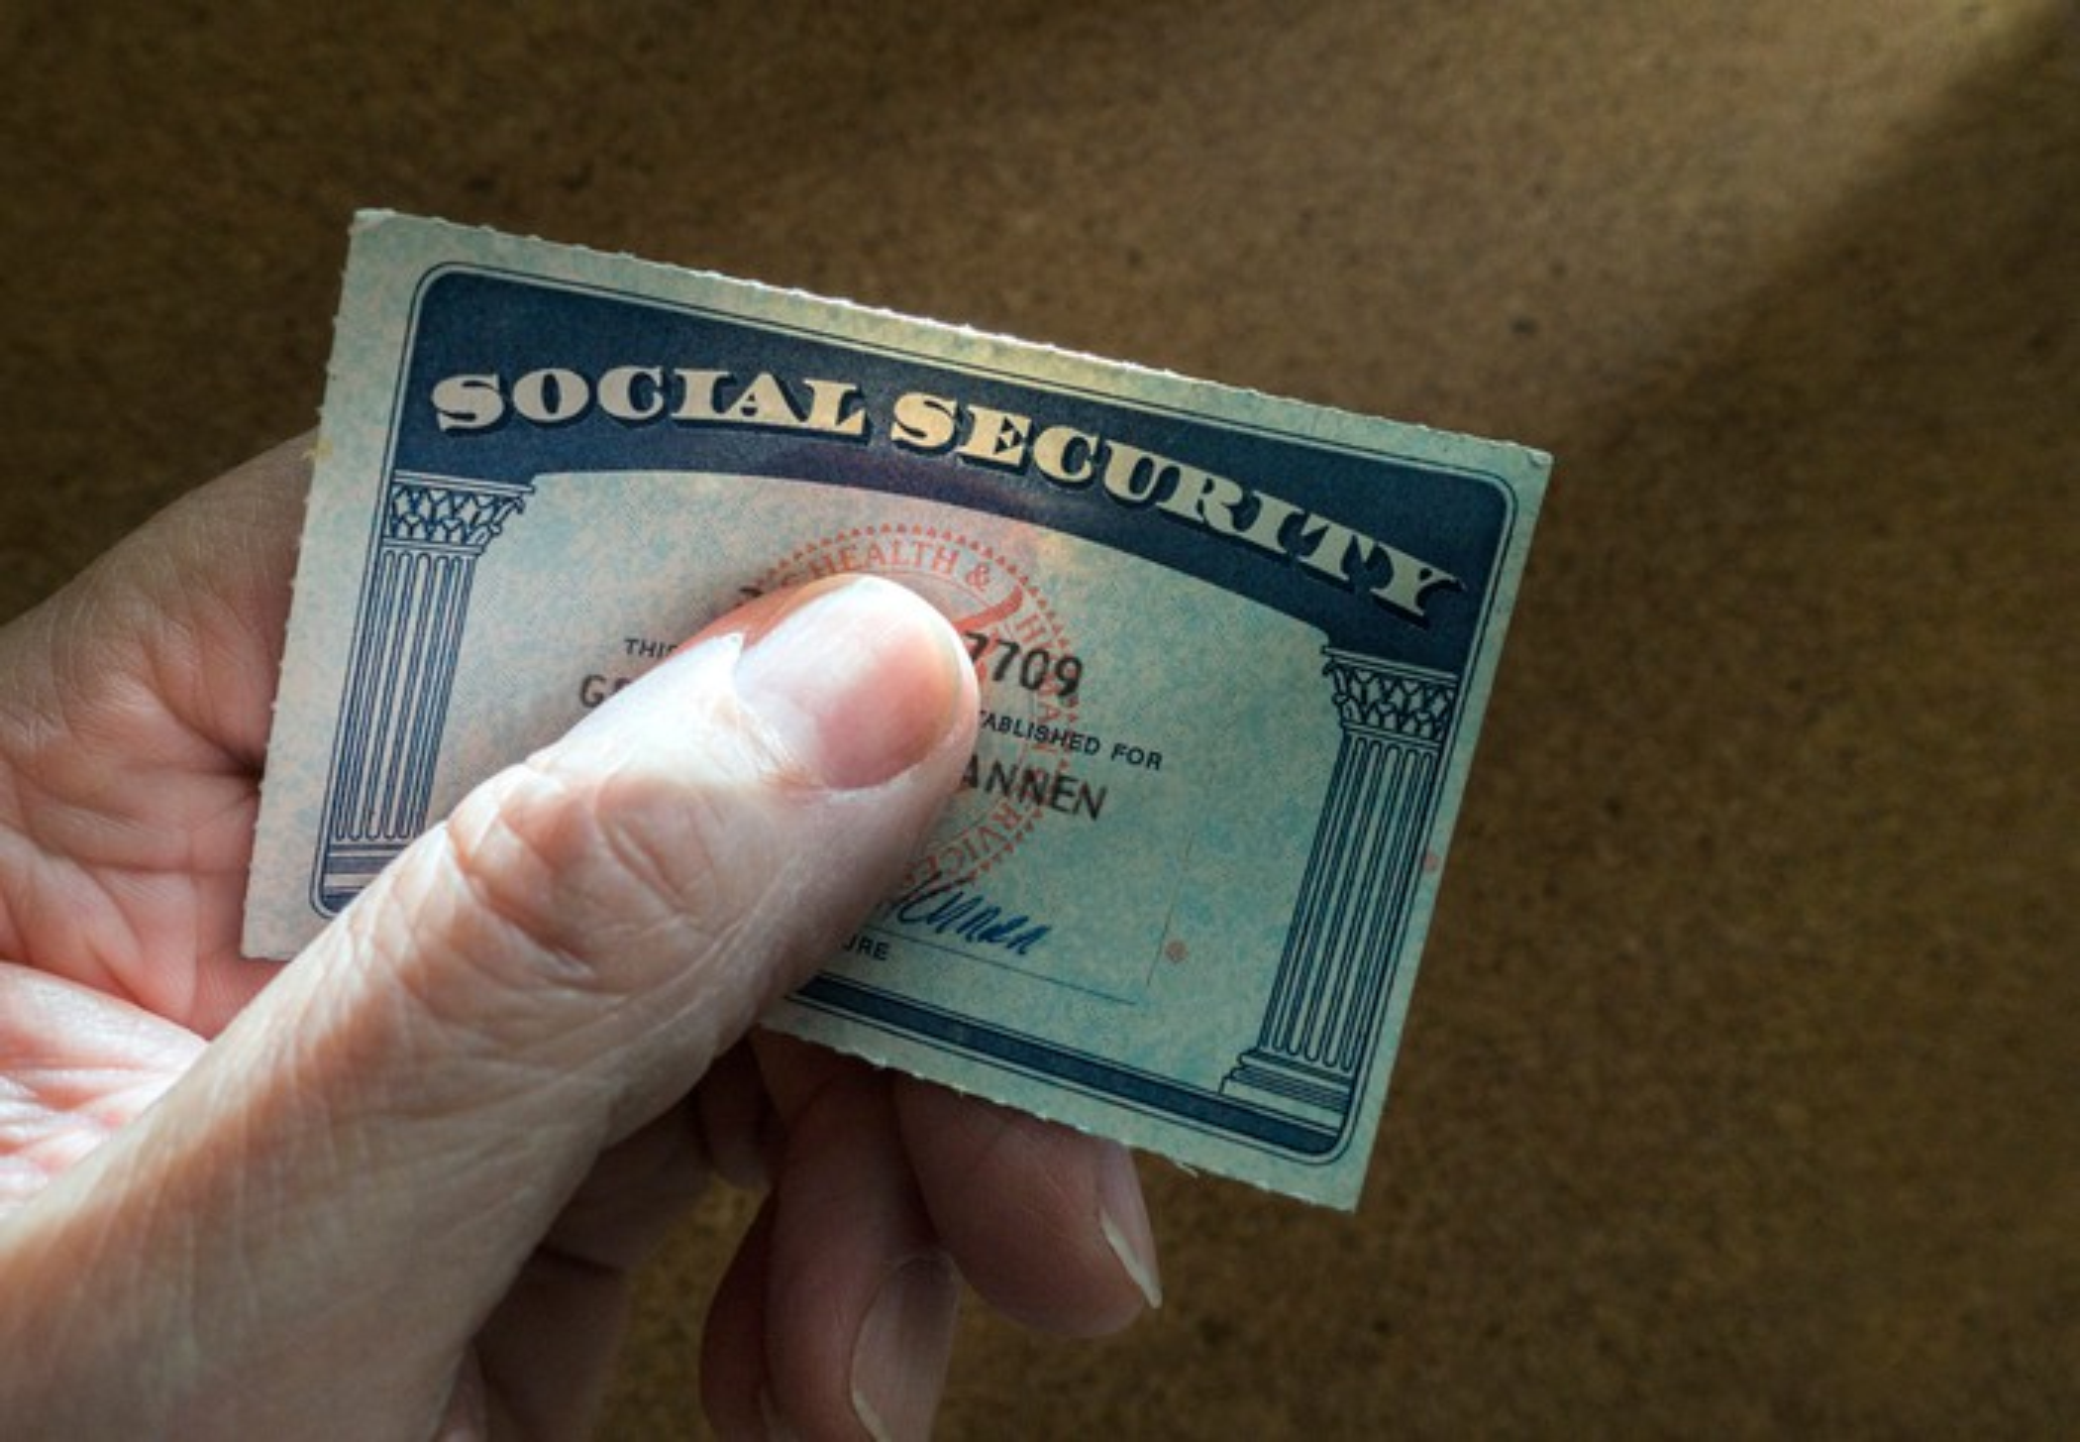 A hand holding a Social Security Card.